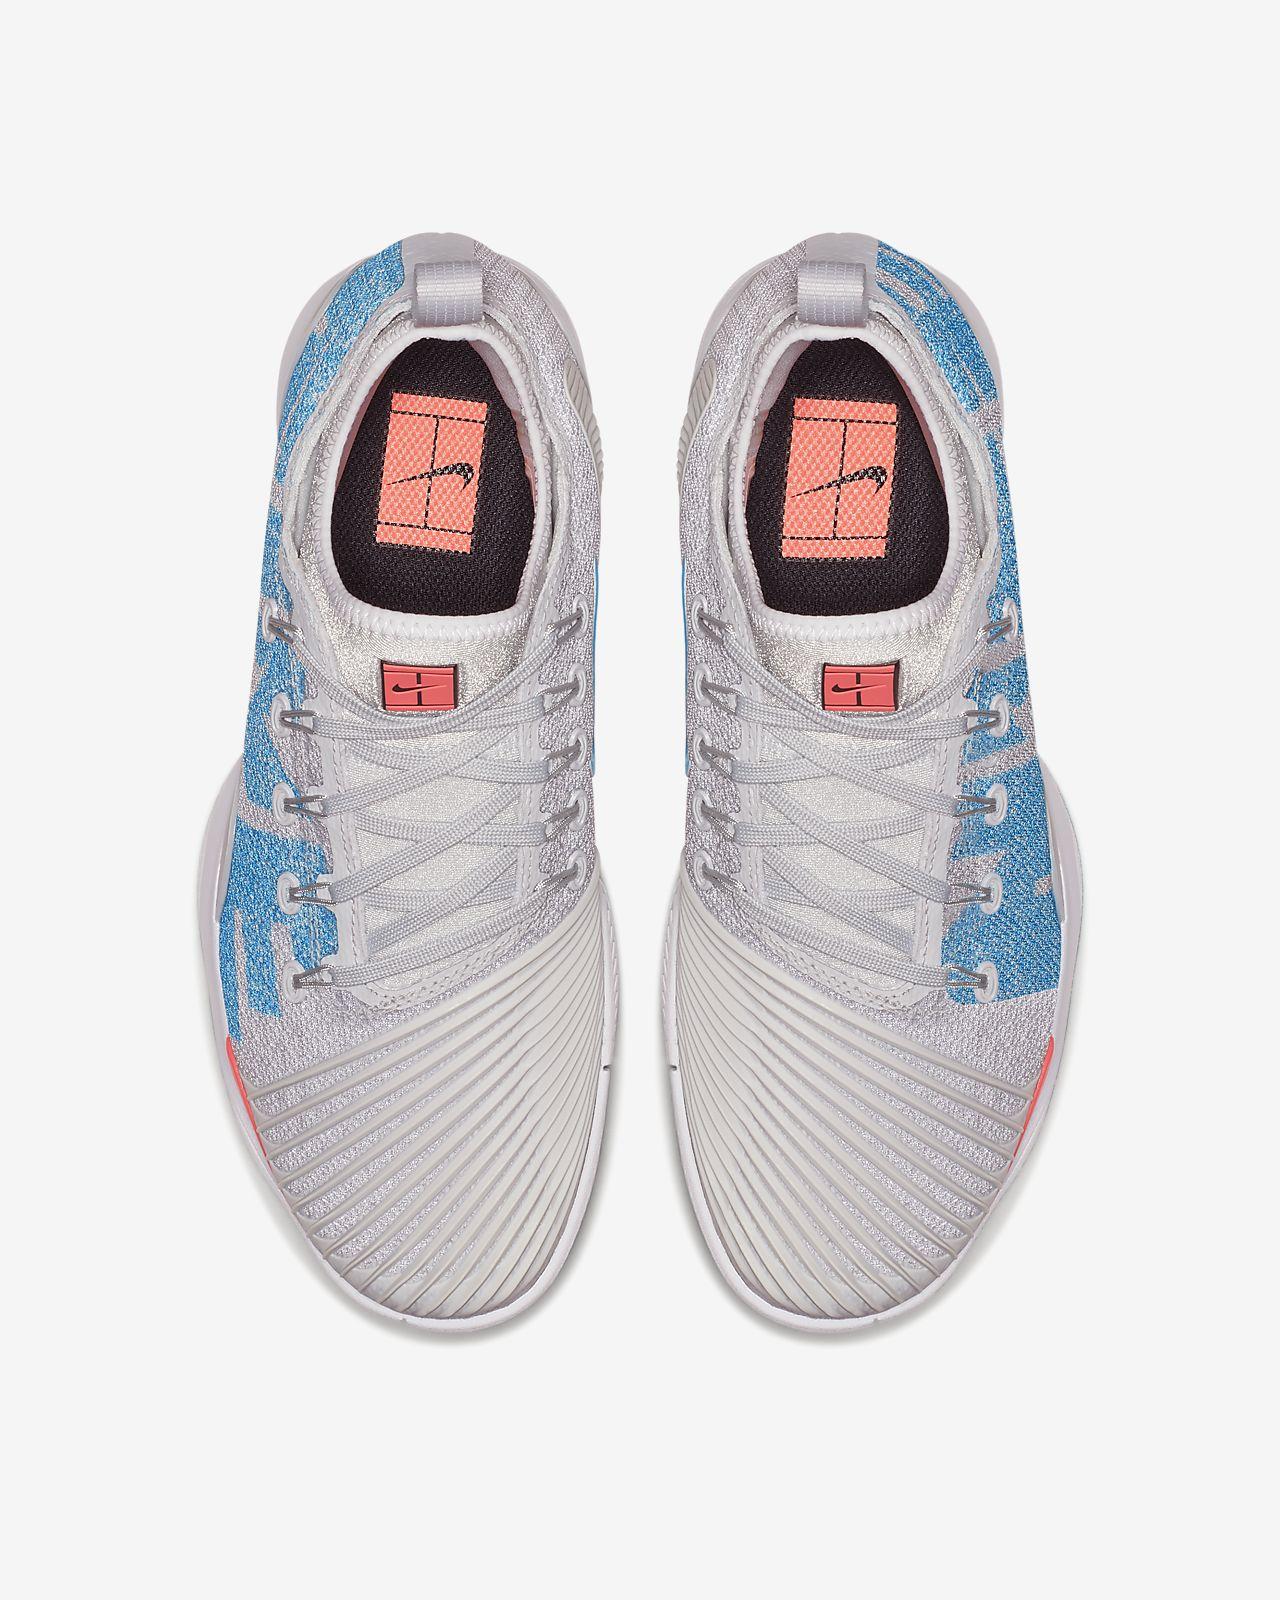 huge selection of e9b7b e7fd0 ... Nike - Air Zoom Ultra React Donna Scarpa da tennis (porpora) ...